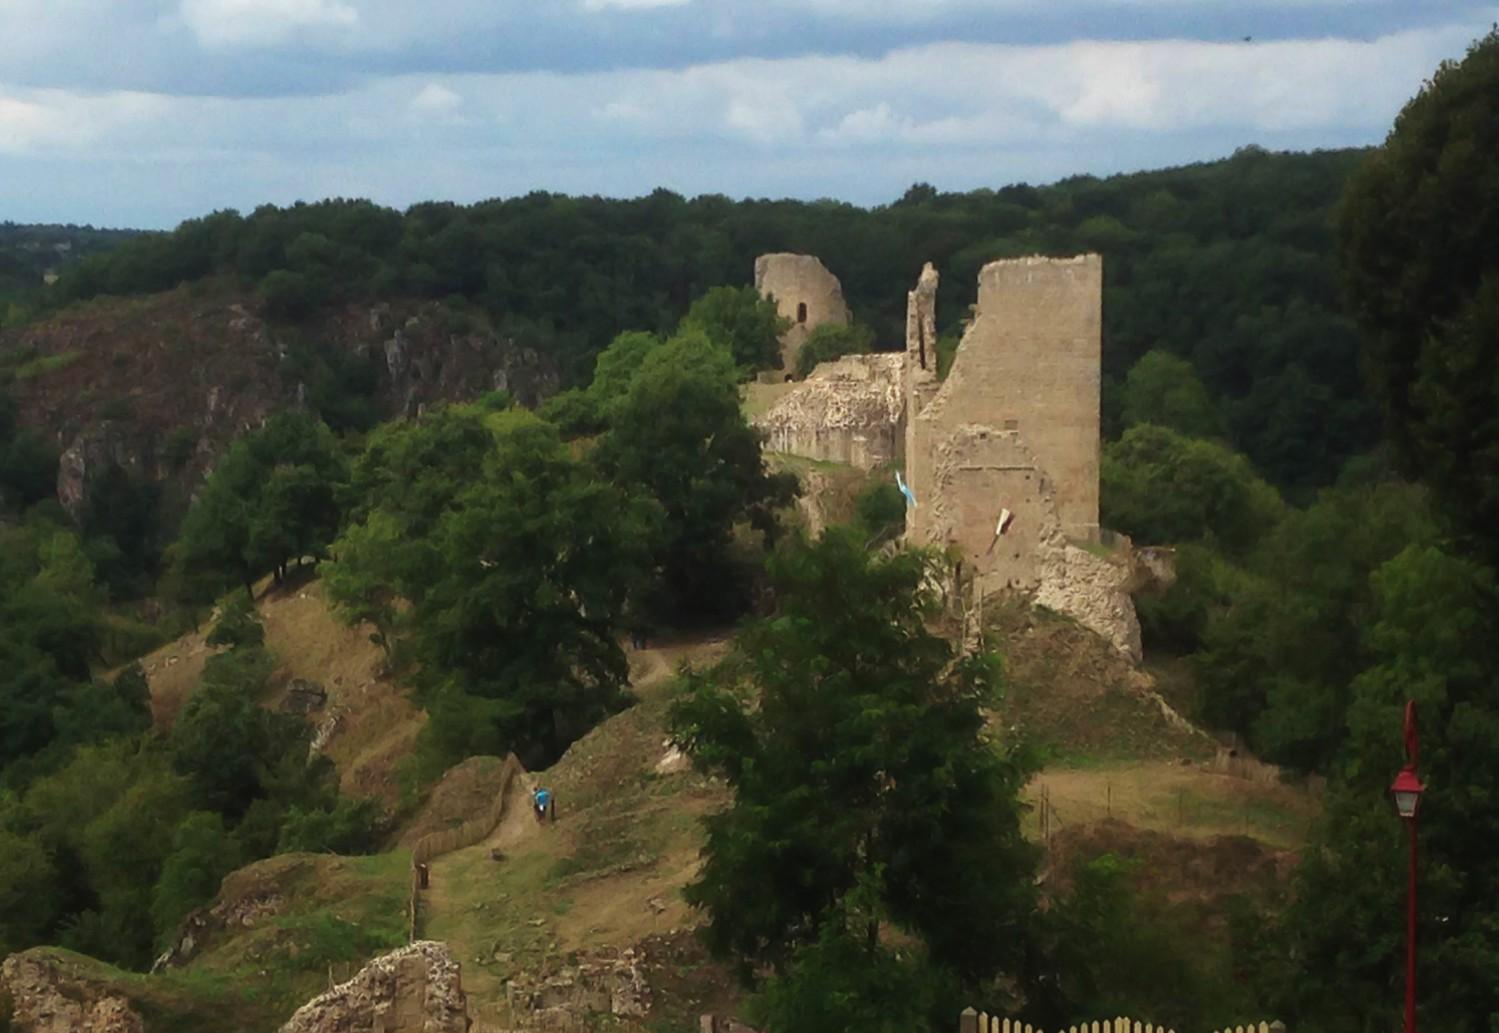 gite-tribu-du-dadet-ruines-de-crozant